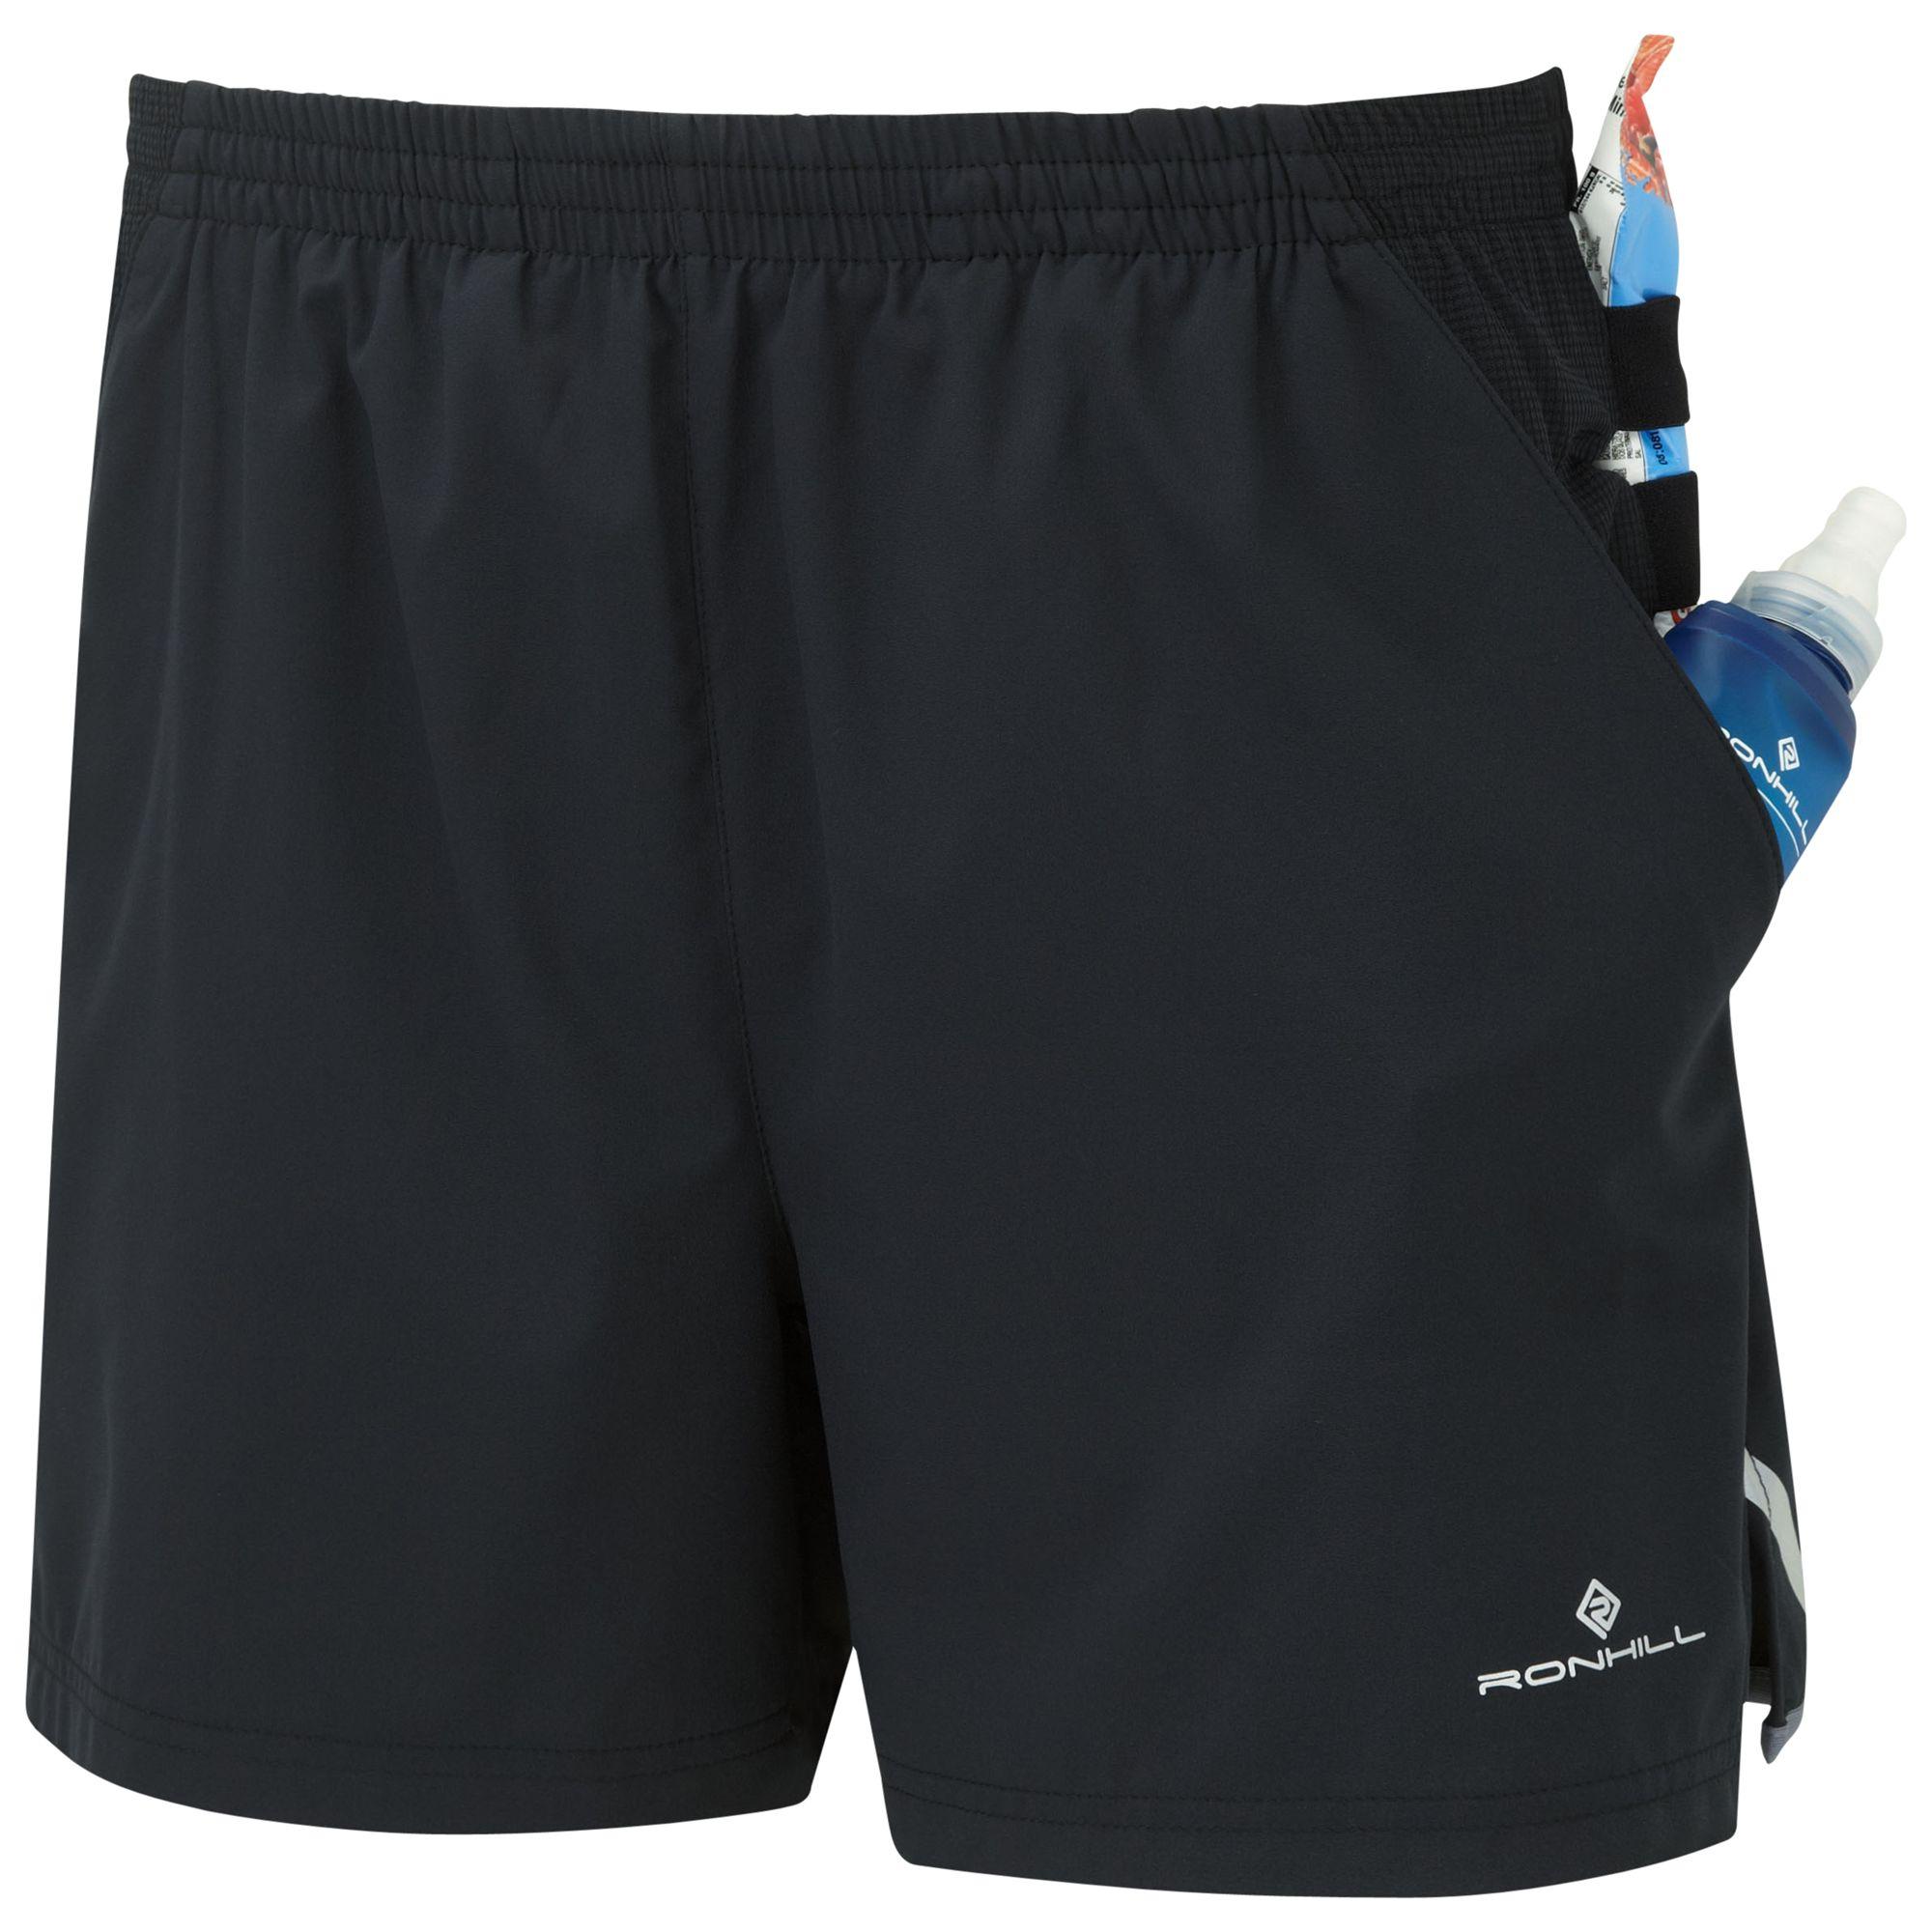 Ronhill Ronhill Stride Cargo Running Shorts, Black